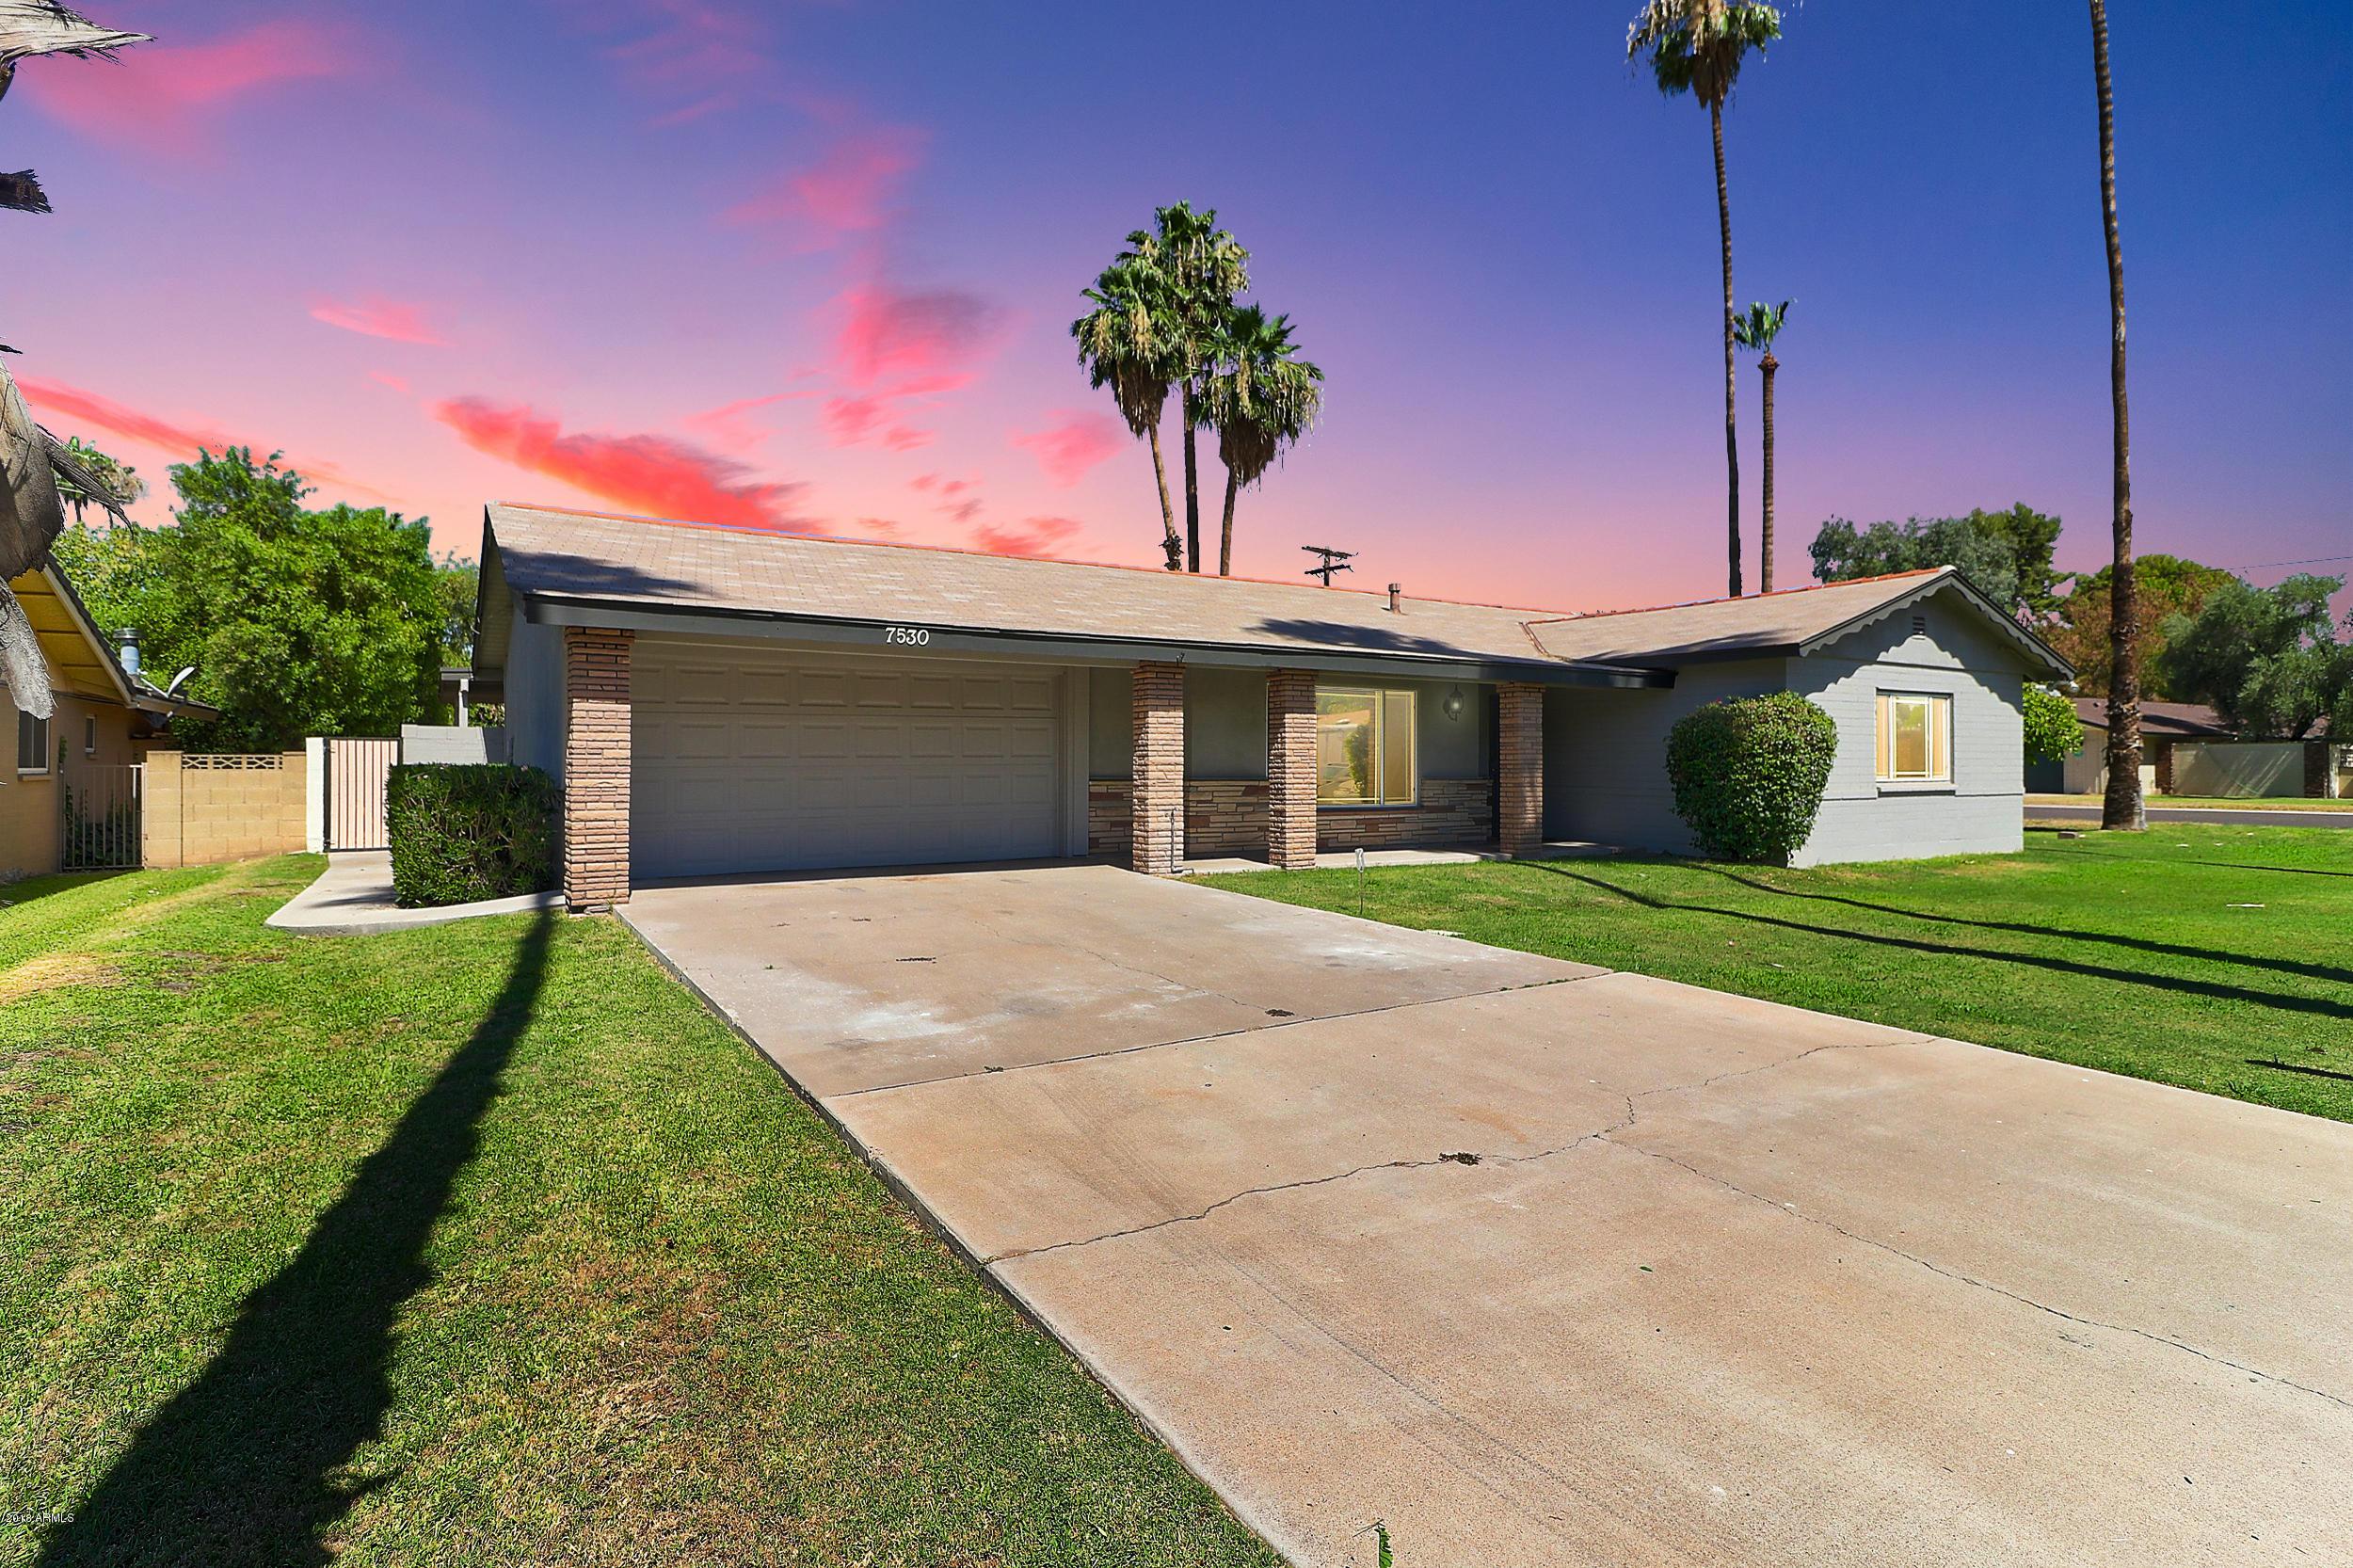 Photo of 7530 N 7TH Avenue, Phoenix, AZ 85021